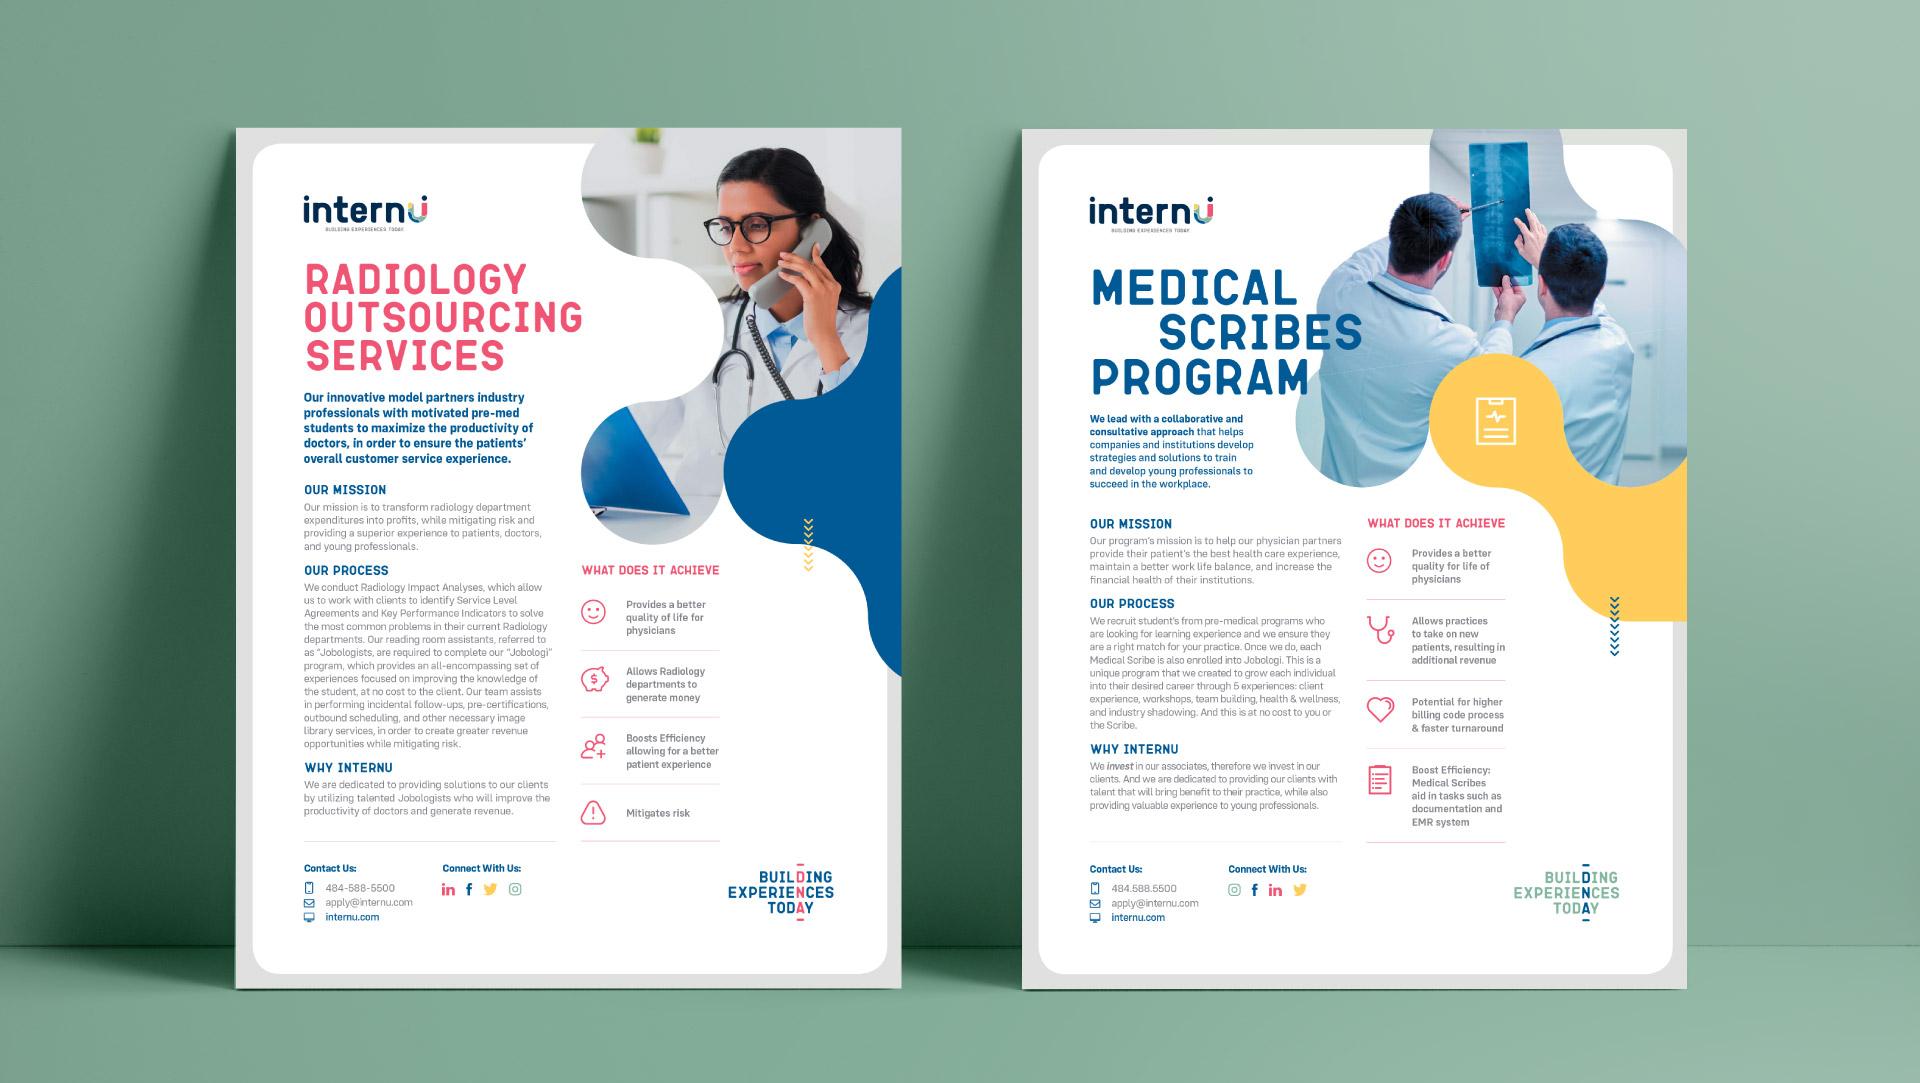 internU recruitment branding applied to their medical scribes.